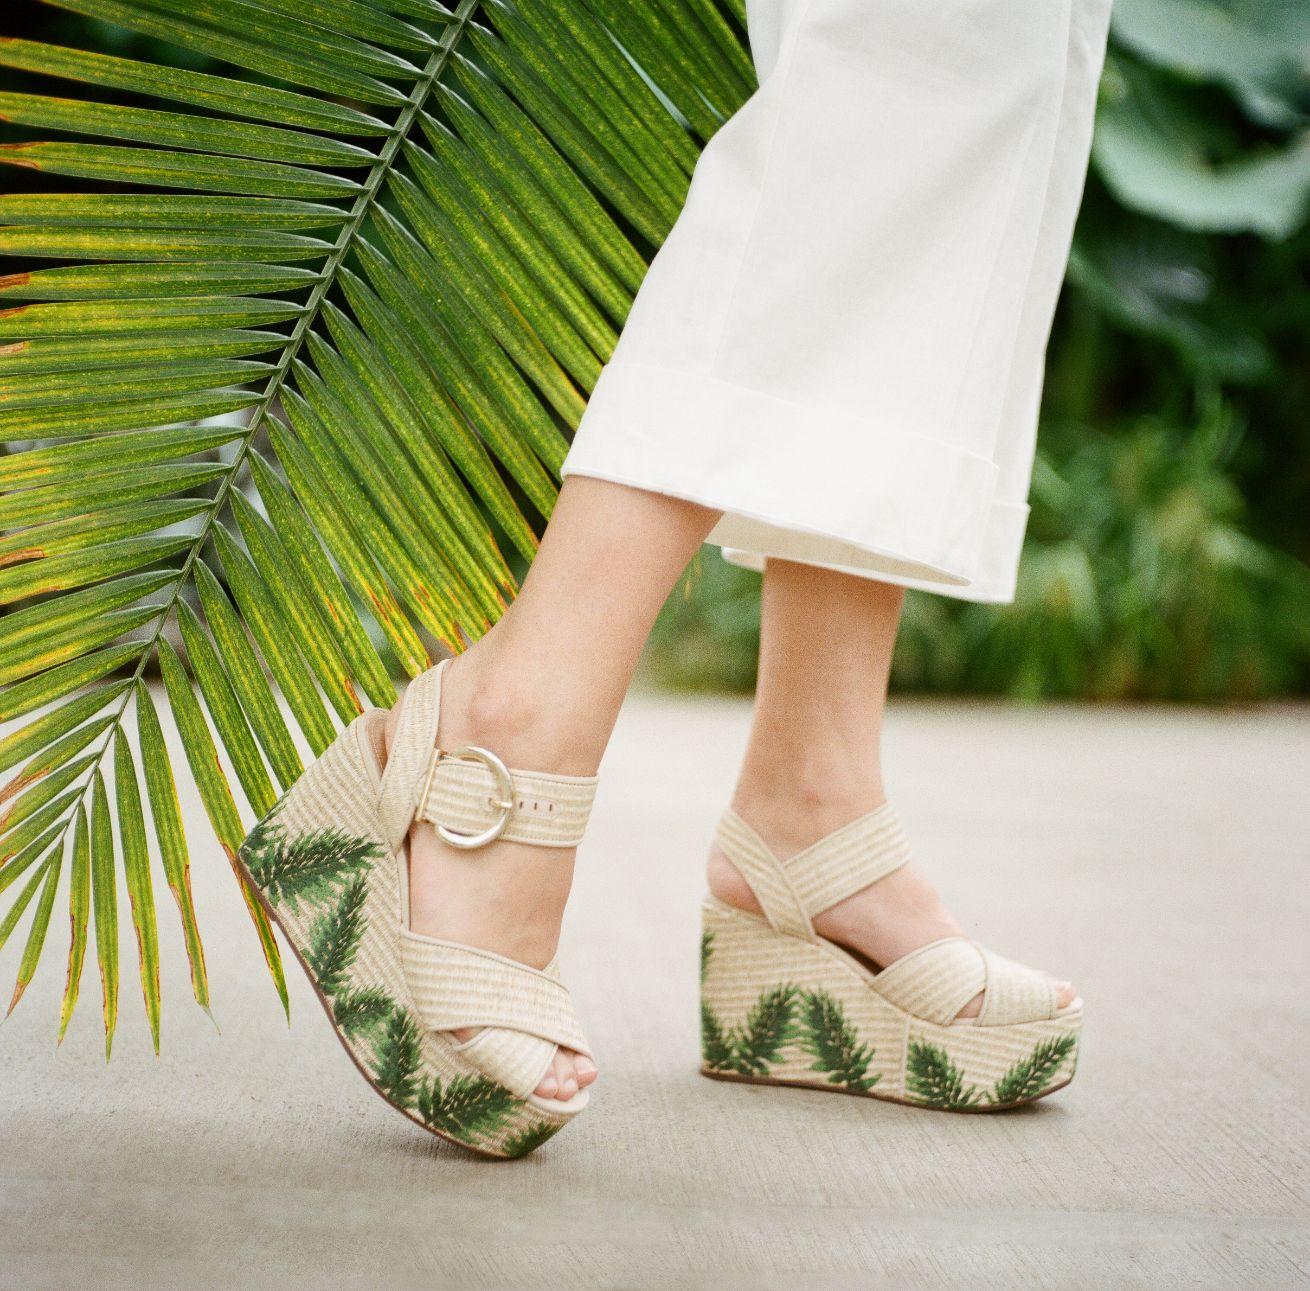 roger-williams-park-botanical-tropical-peach-daylynn-designs022.jpg